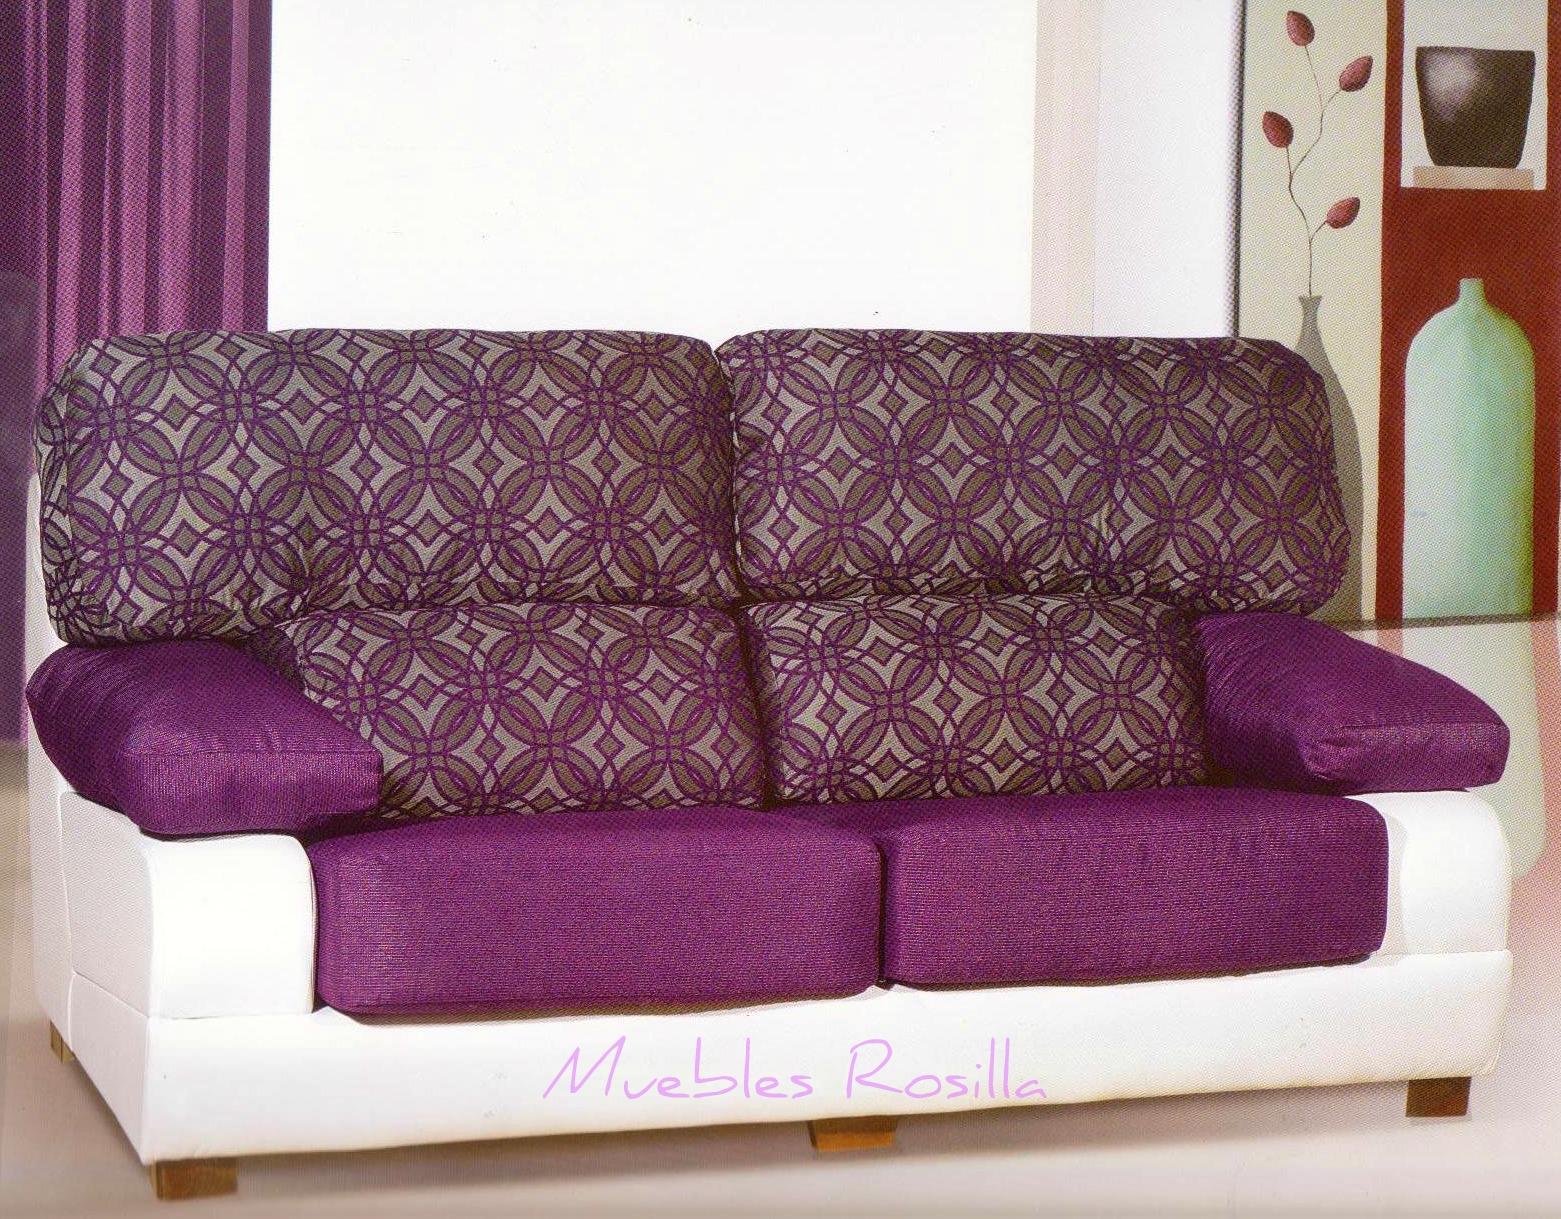 Muebles rosilla herv s sof mod for Sofas tela rustika